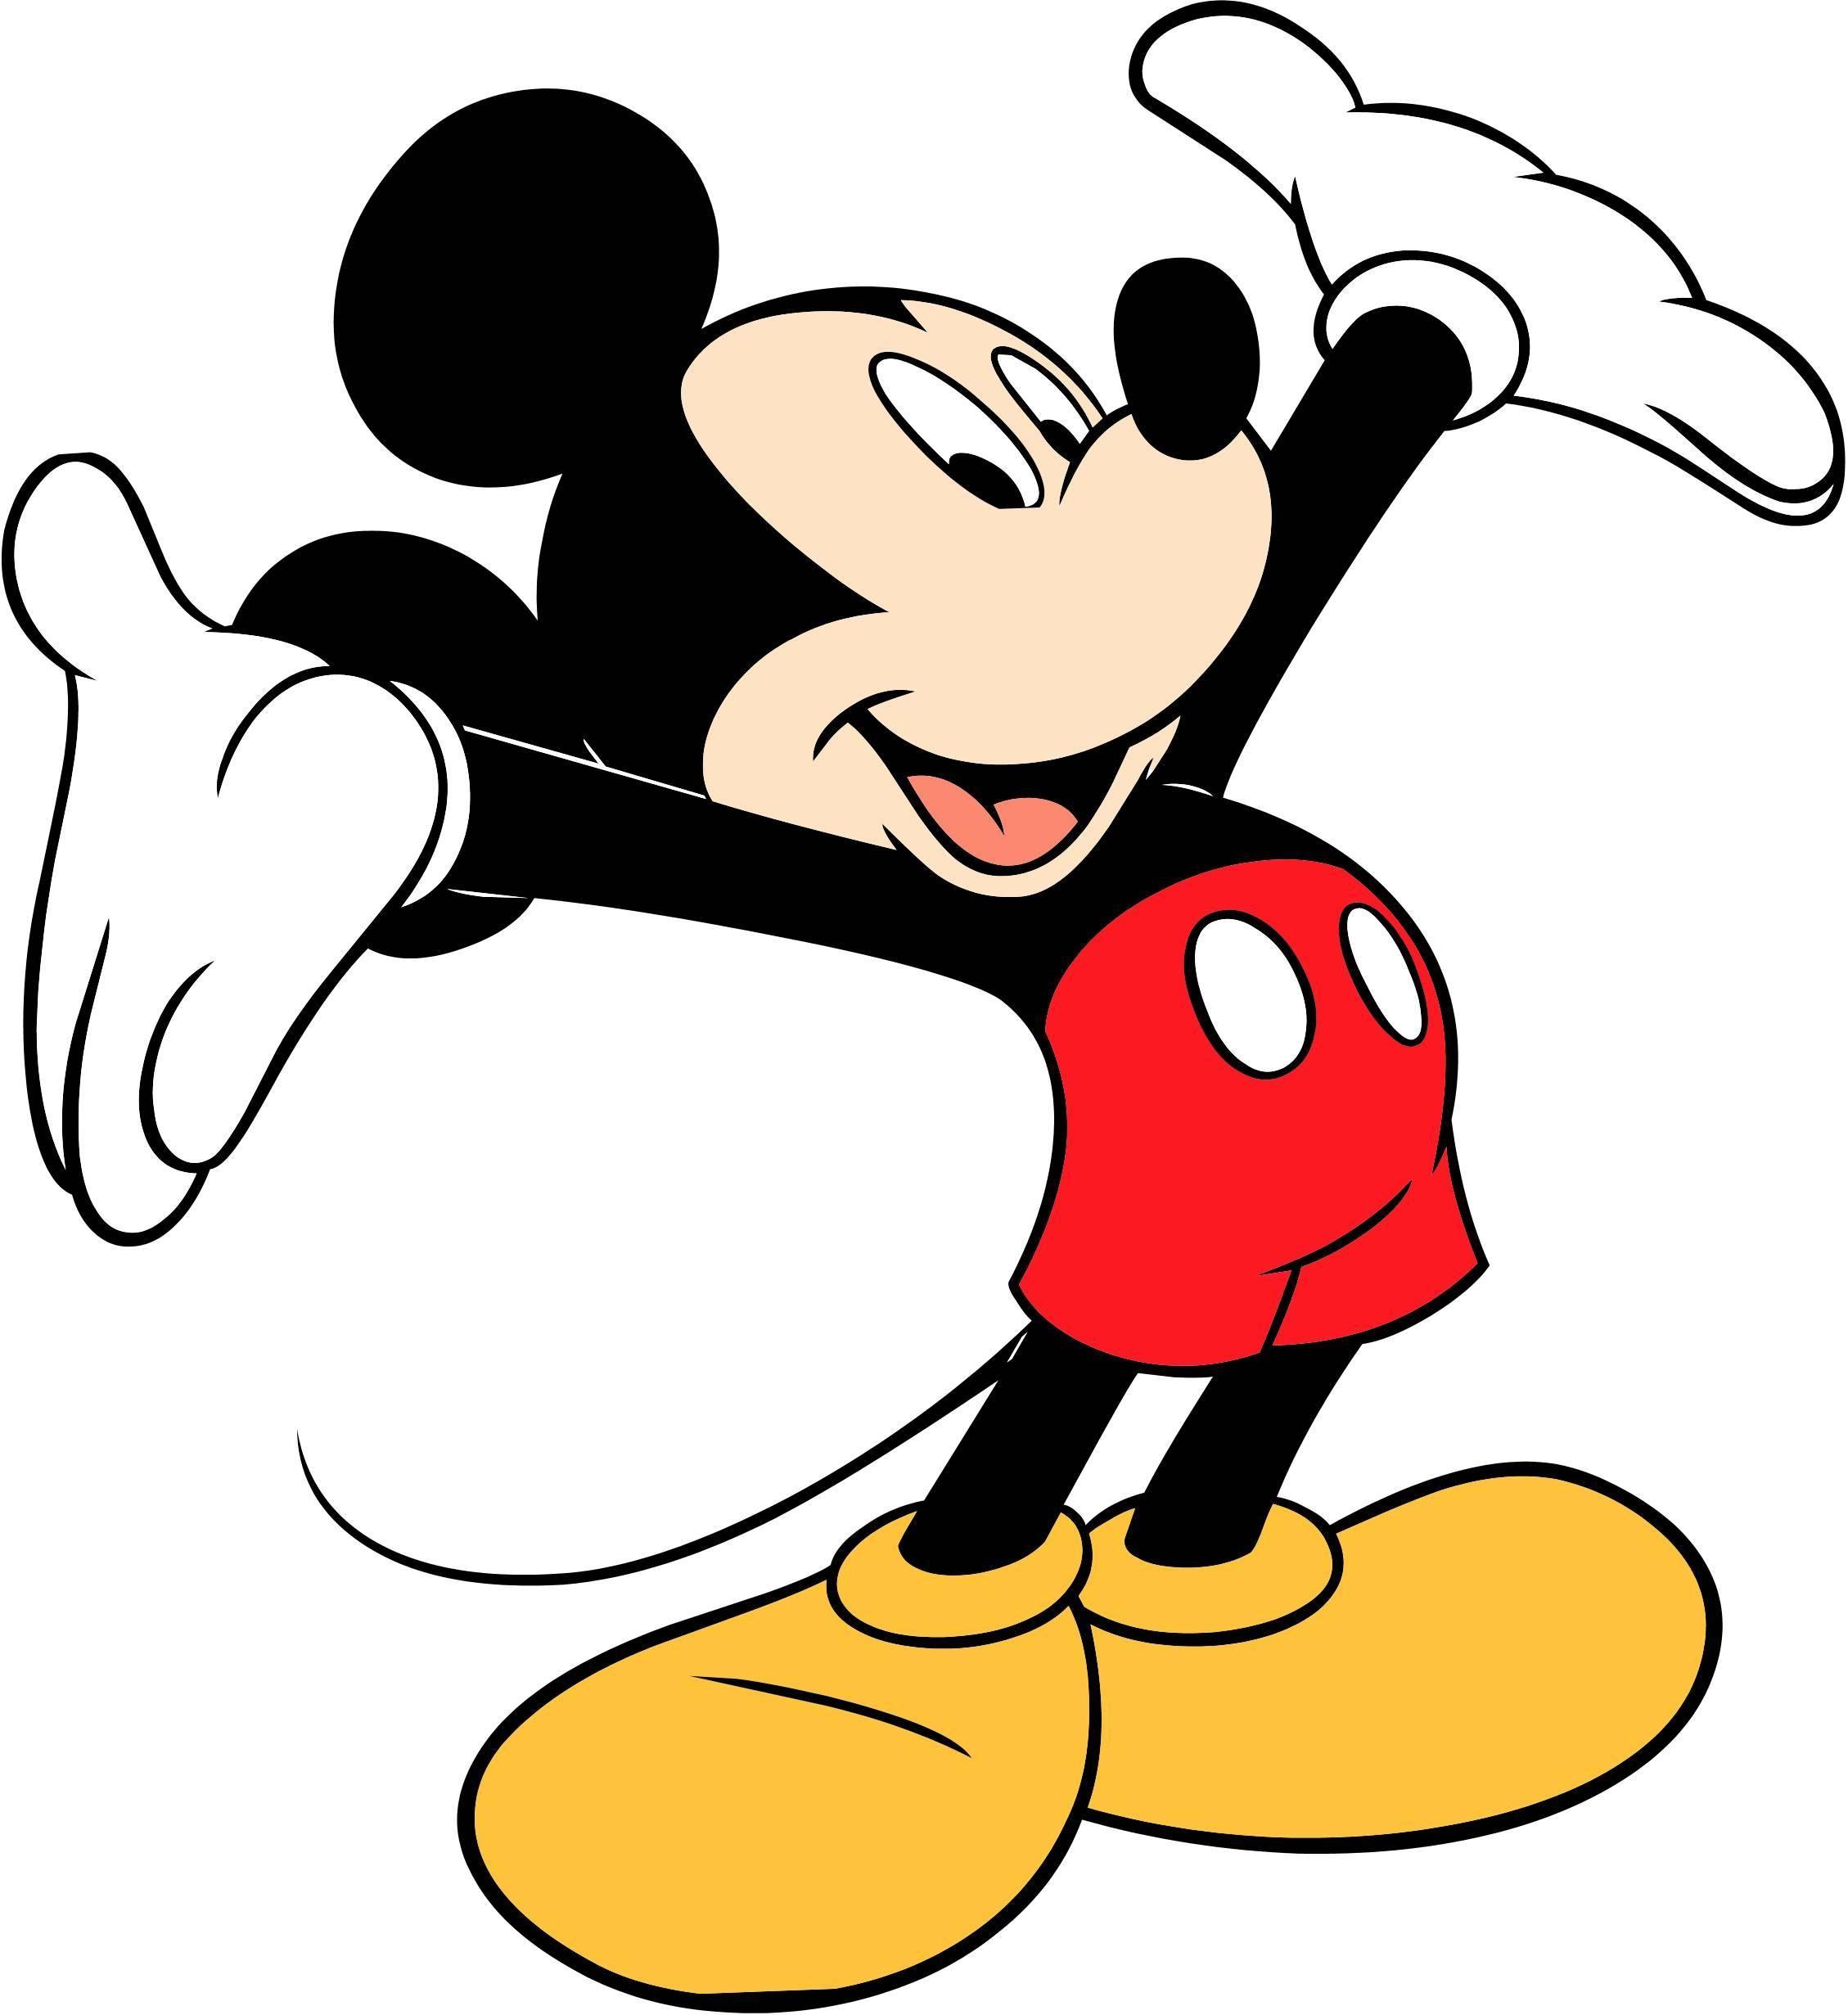 xmas stuff for u003e mickey mouse christmas clipart brennan s birthday rh pinterest com au mickey mouse merry christmas clipart mickey mouse christmas clip art free